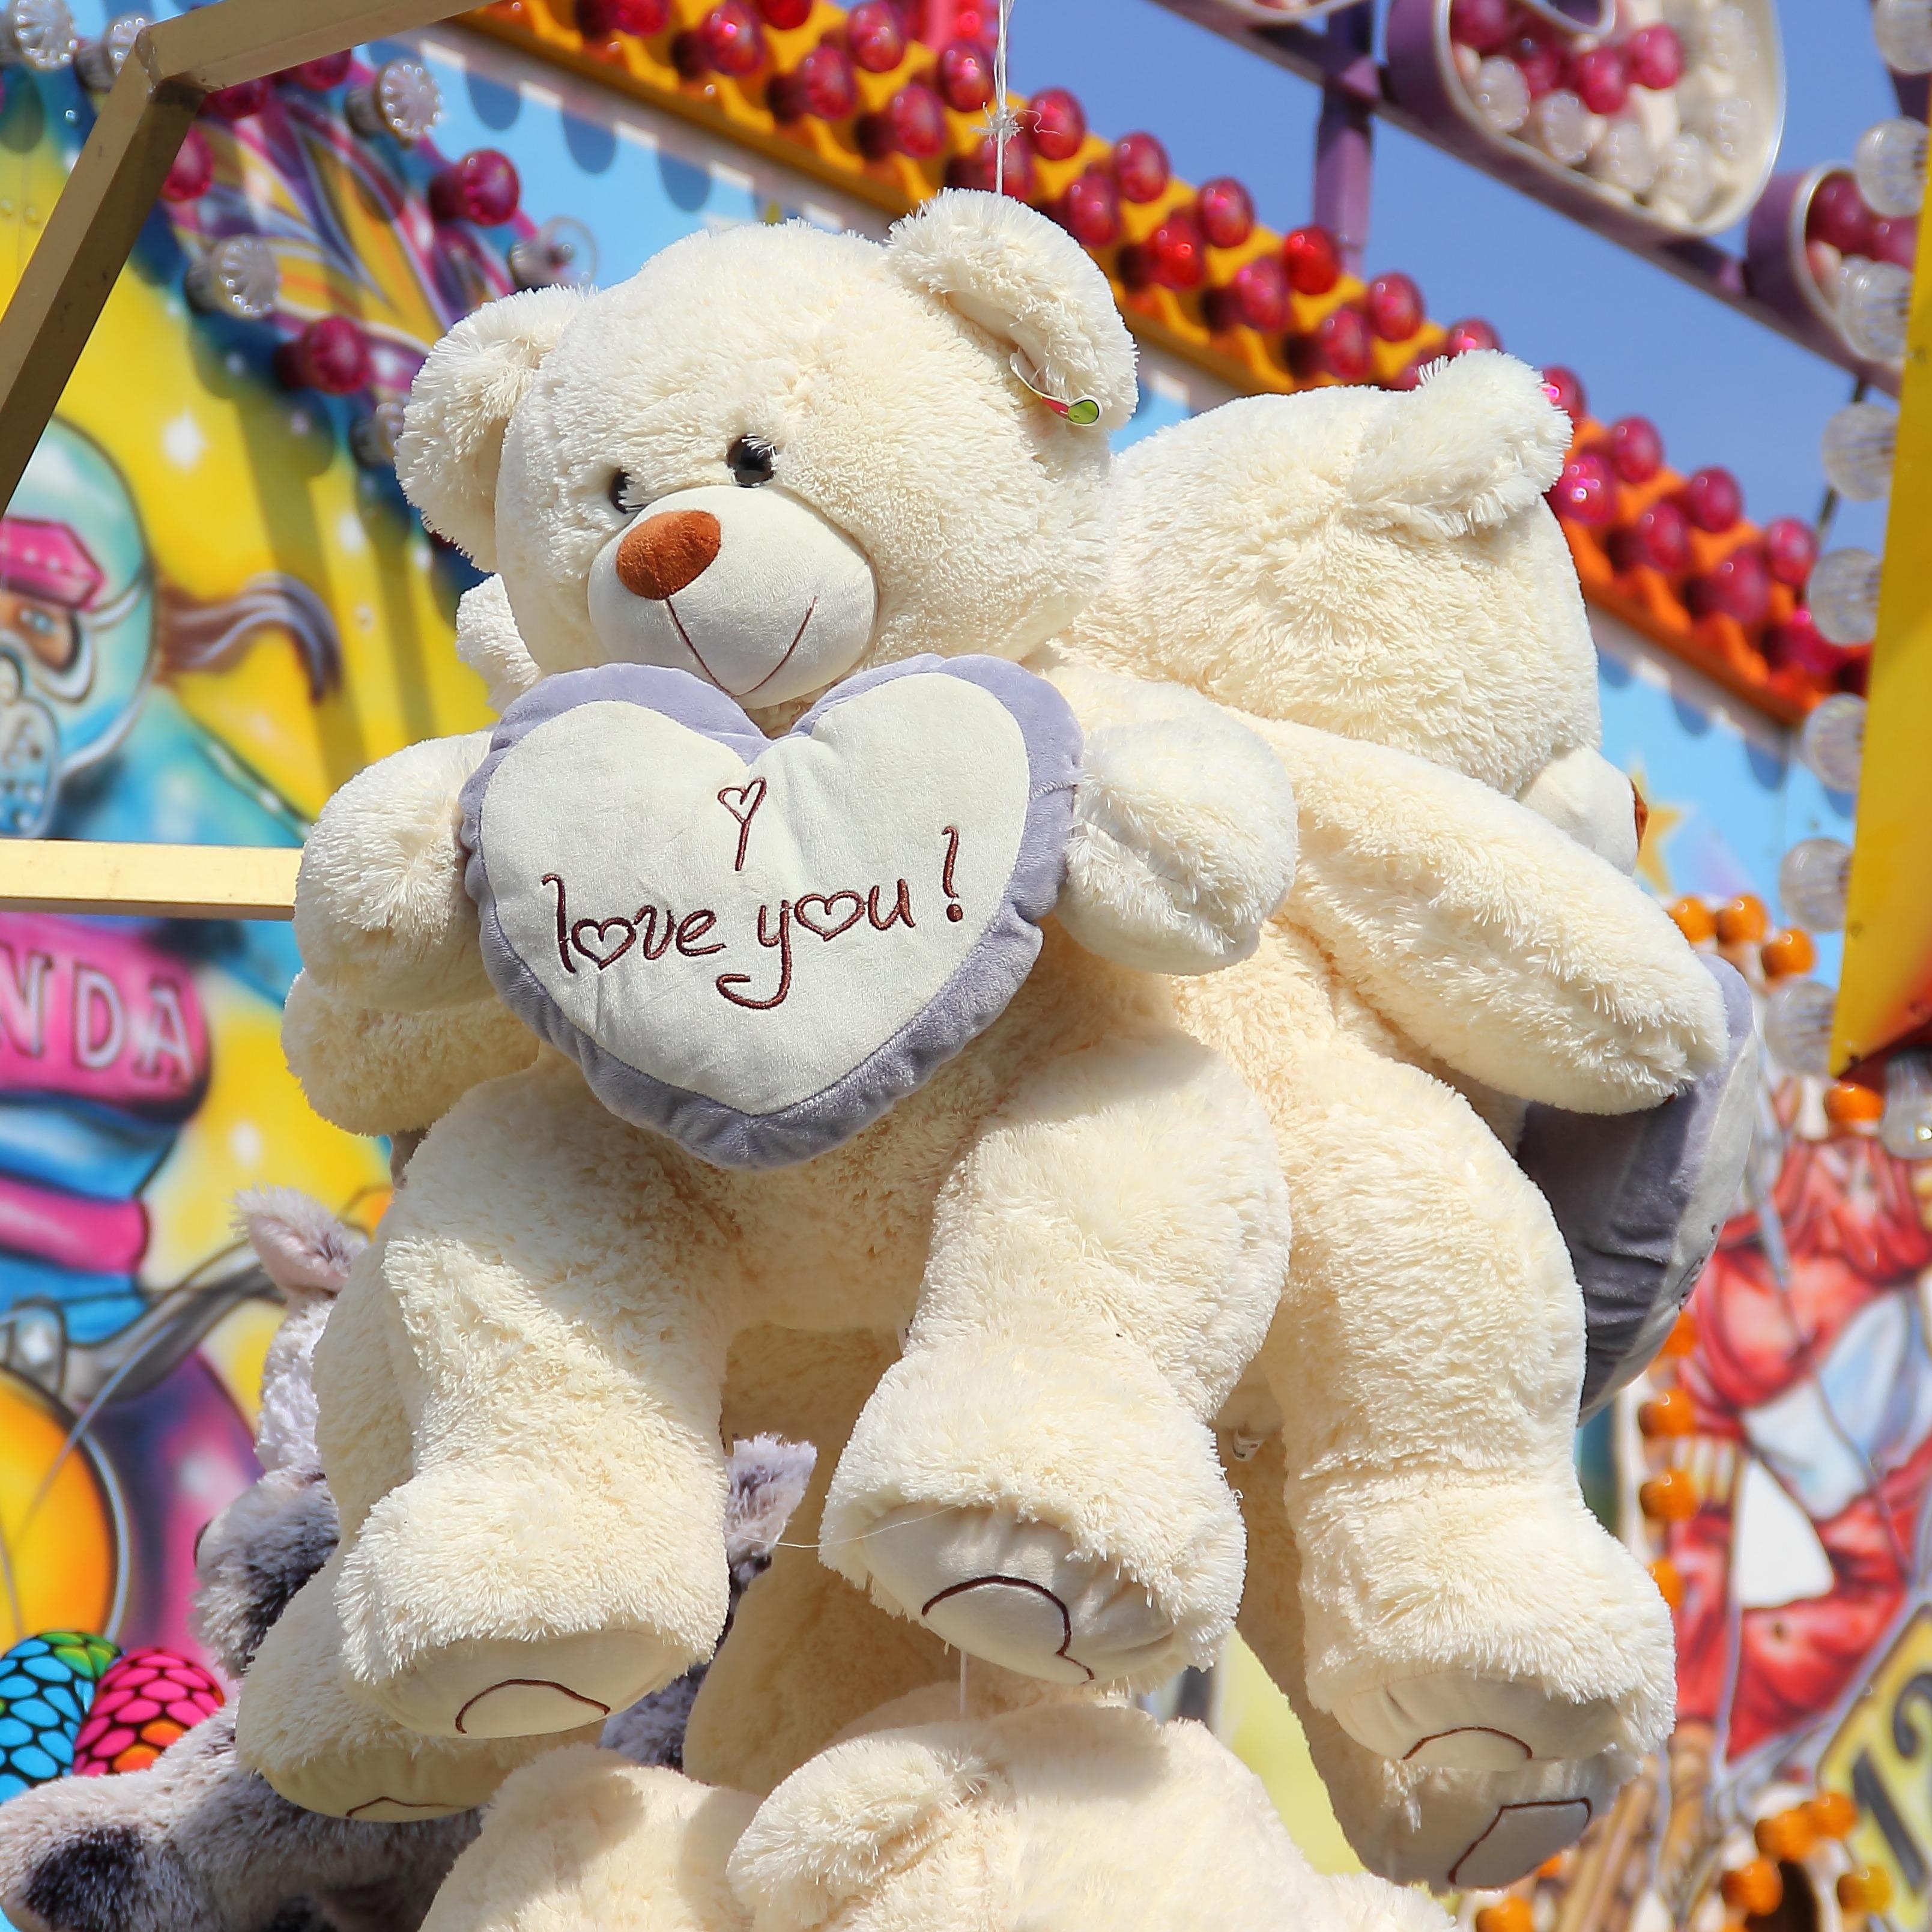 Free Images : cute, heart, colorful, leisure, fairground, teddy bear,  textile, affection, fun, animals, bears, plush, stuffed animal, fair,  pleasure, ...